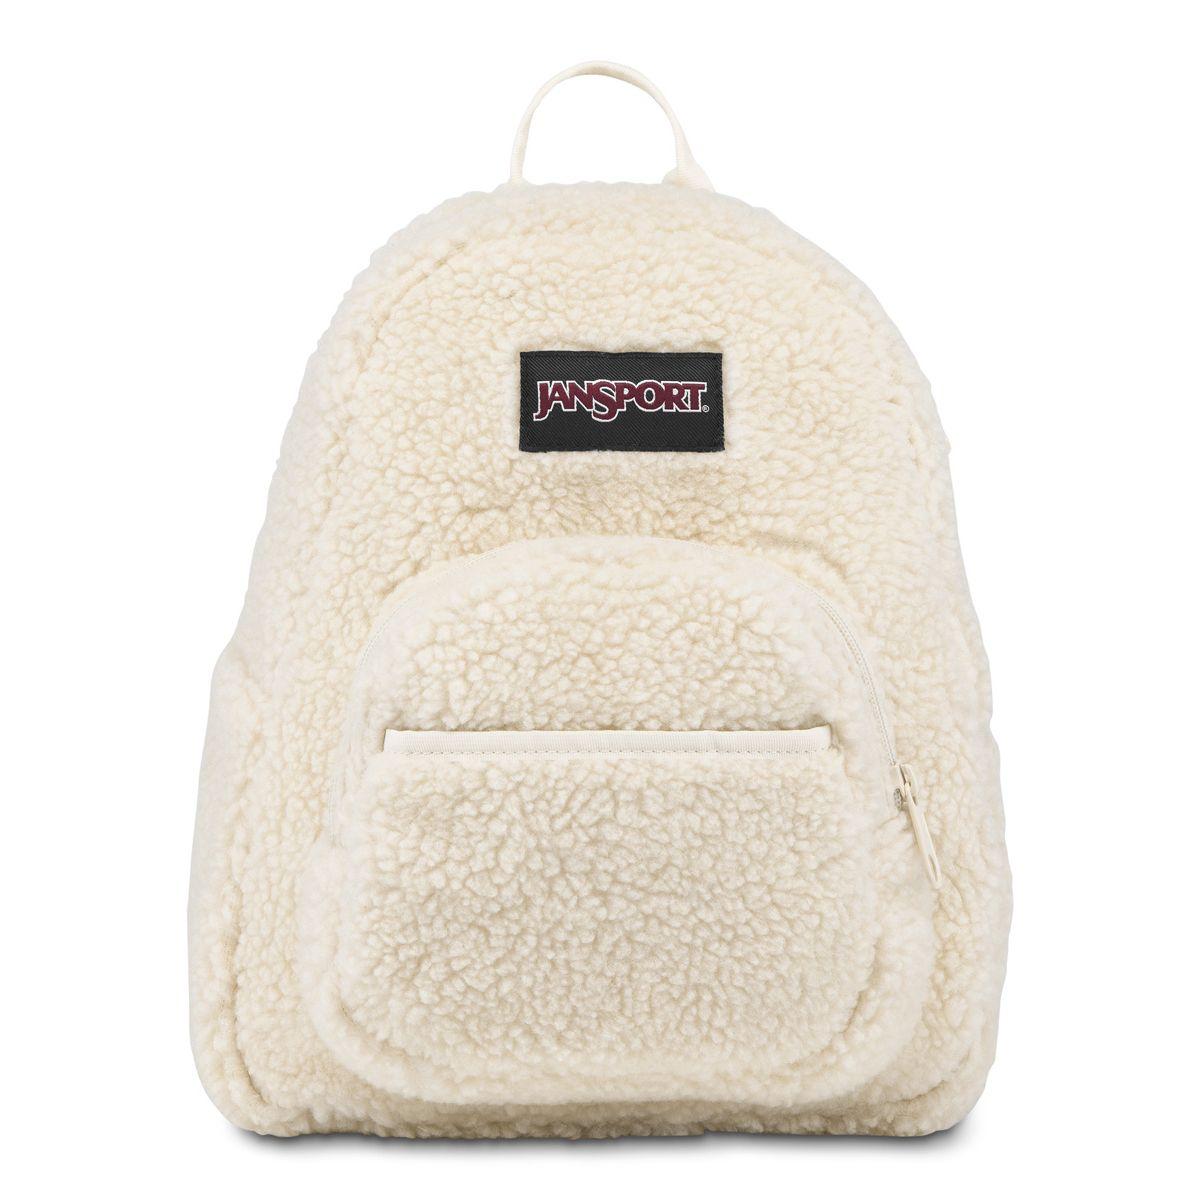 JanSport Half Pint FX Mini Backpack in Soft Tan Sherpa